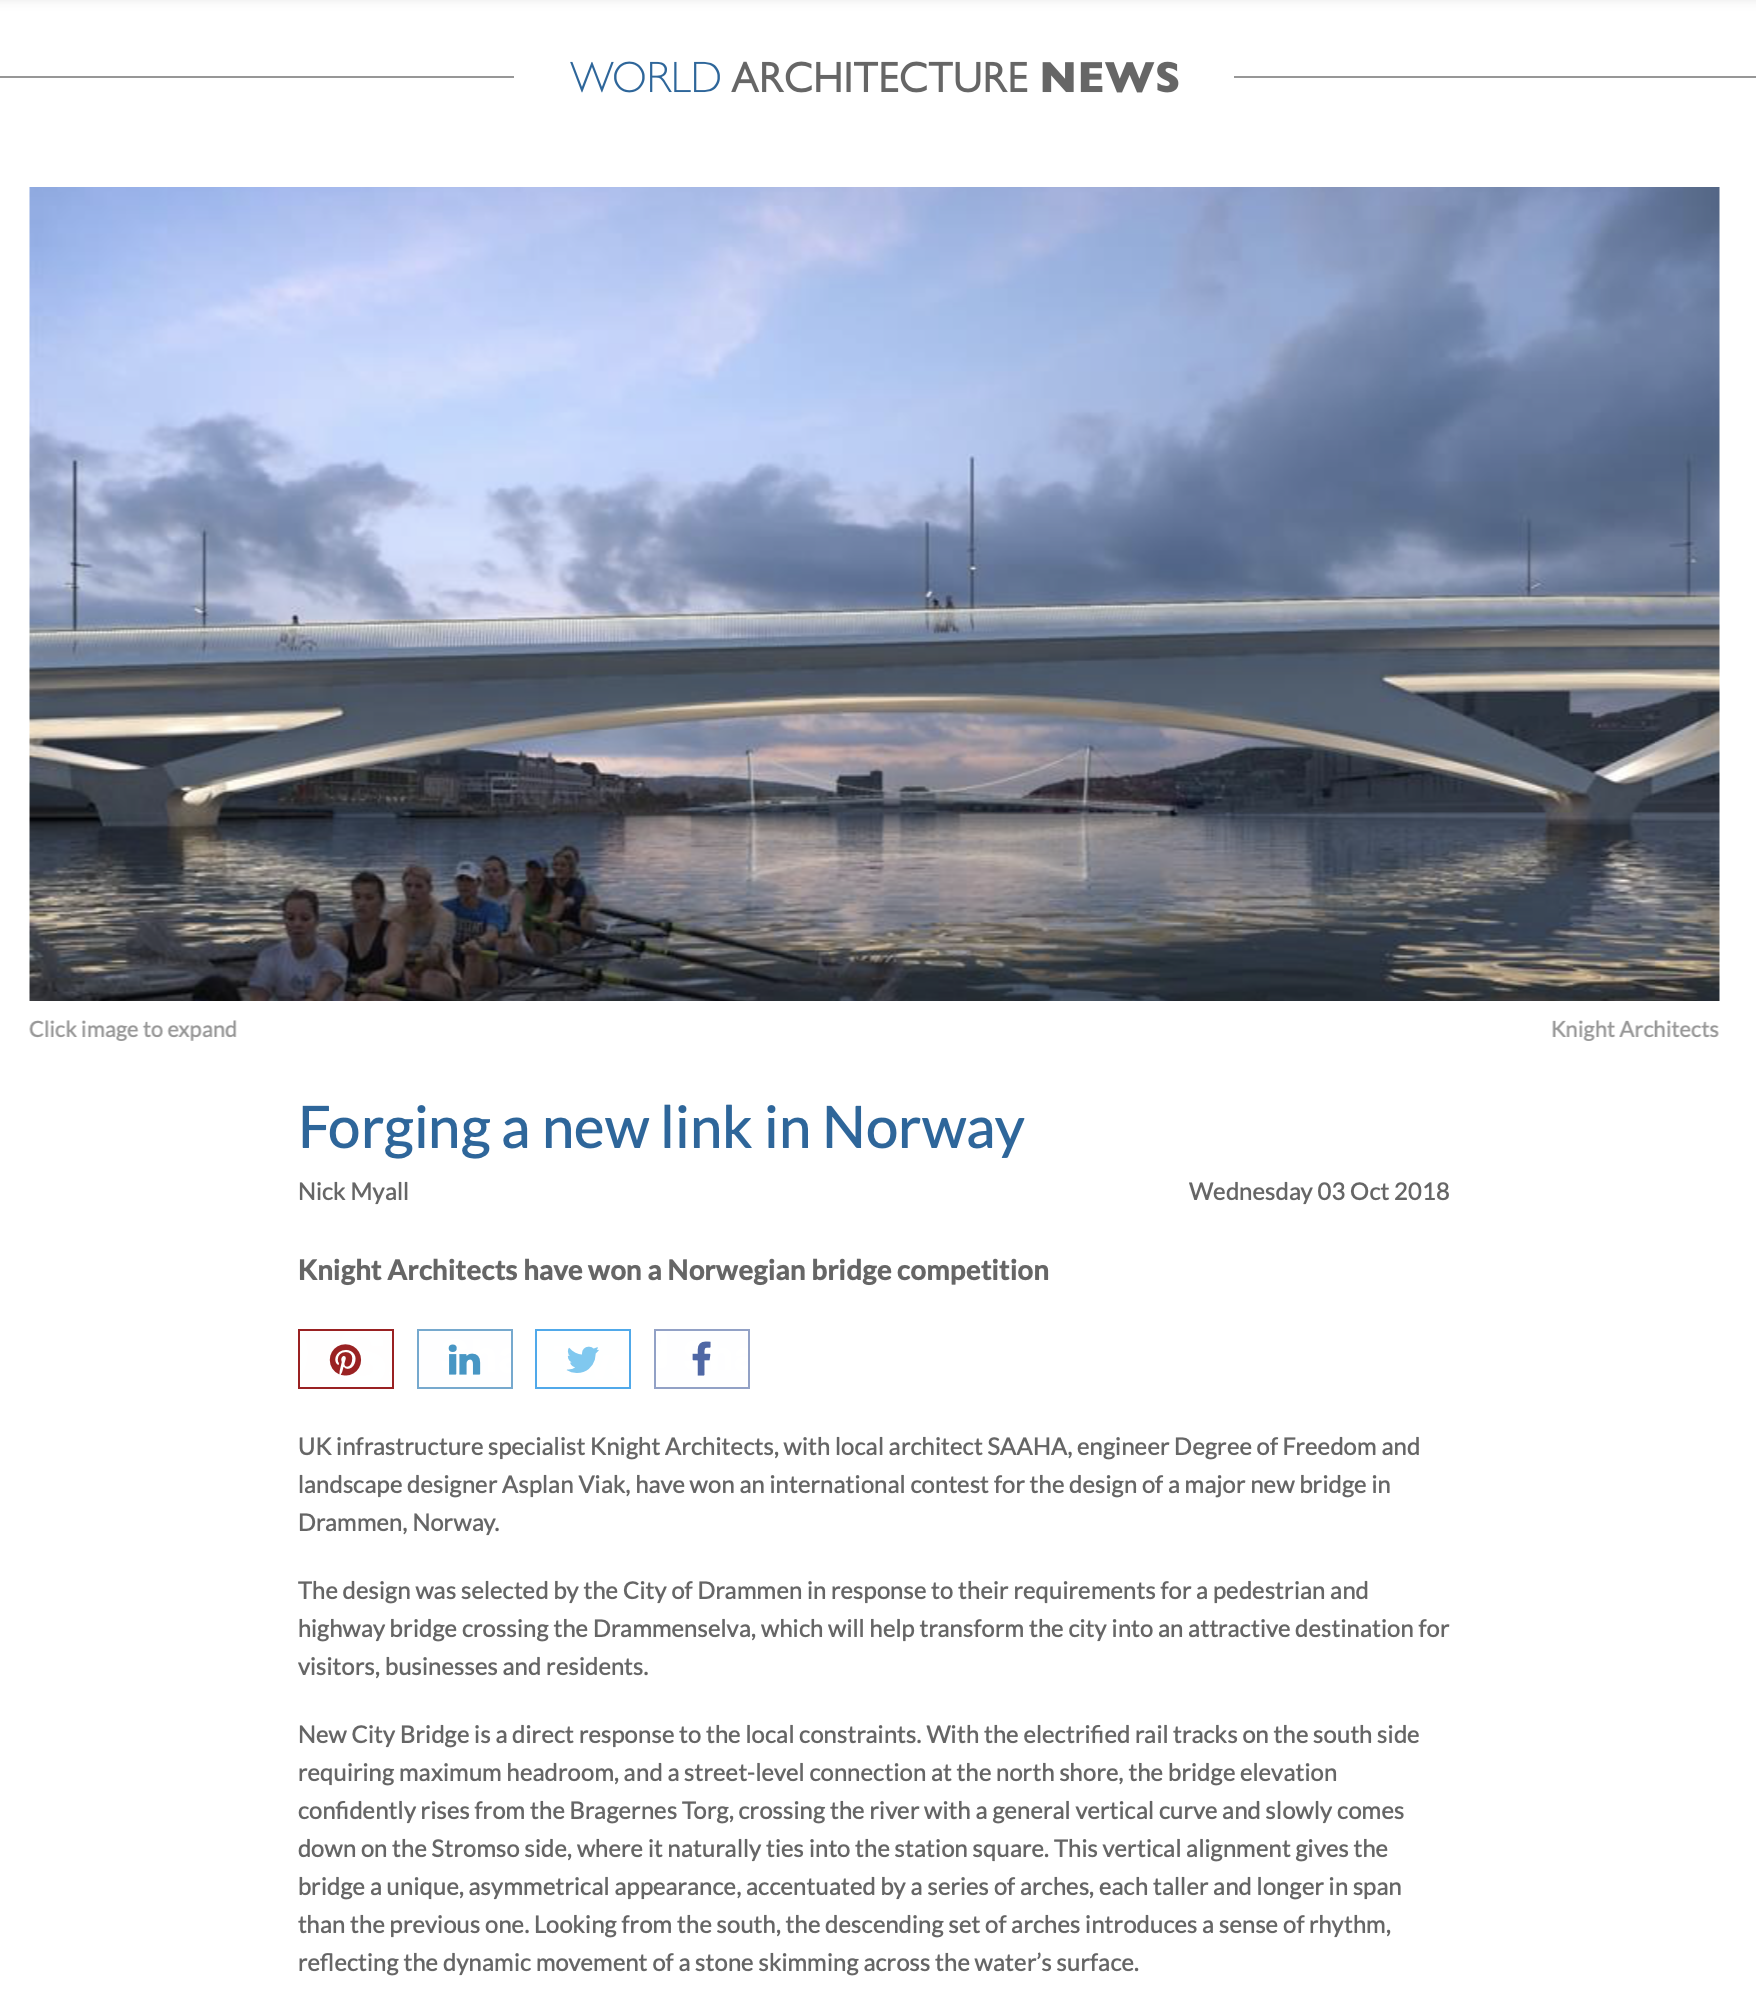 03.10.18 World Architecture News